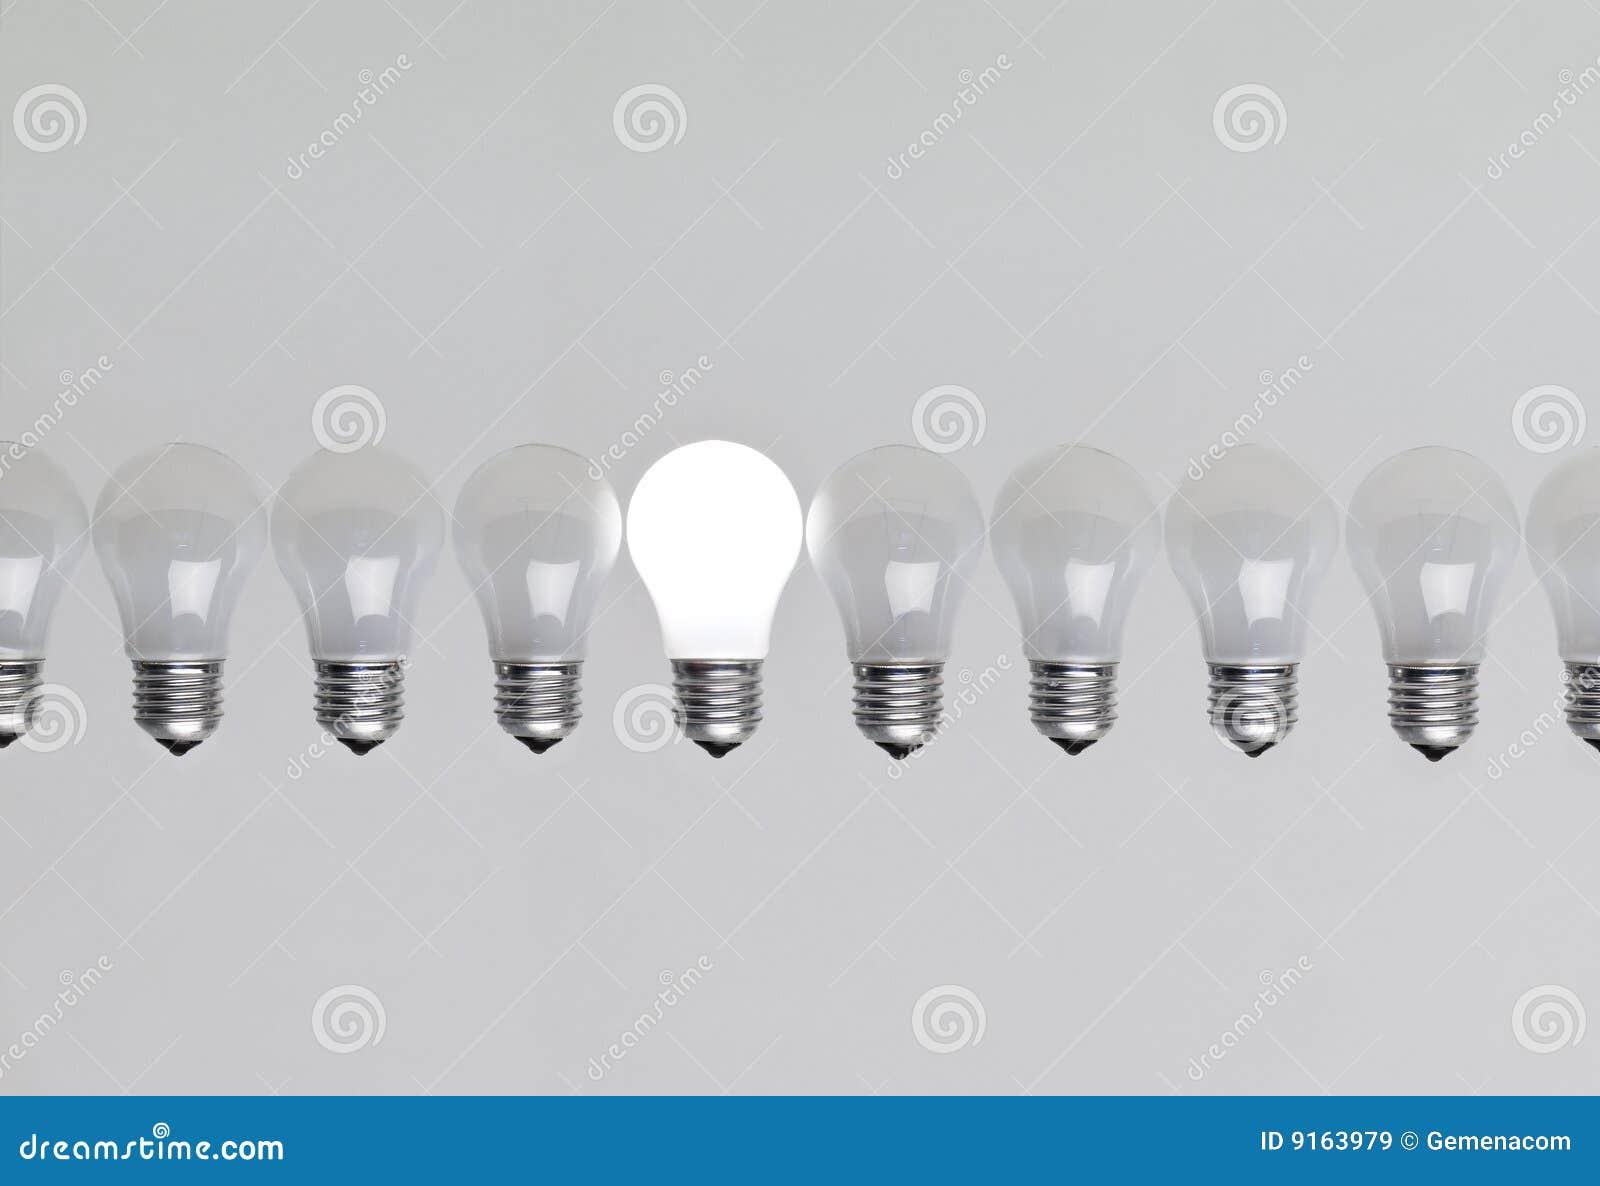 Row of light bulbs stock image. Image of community ...